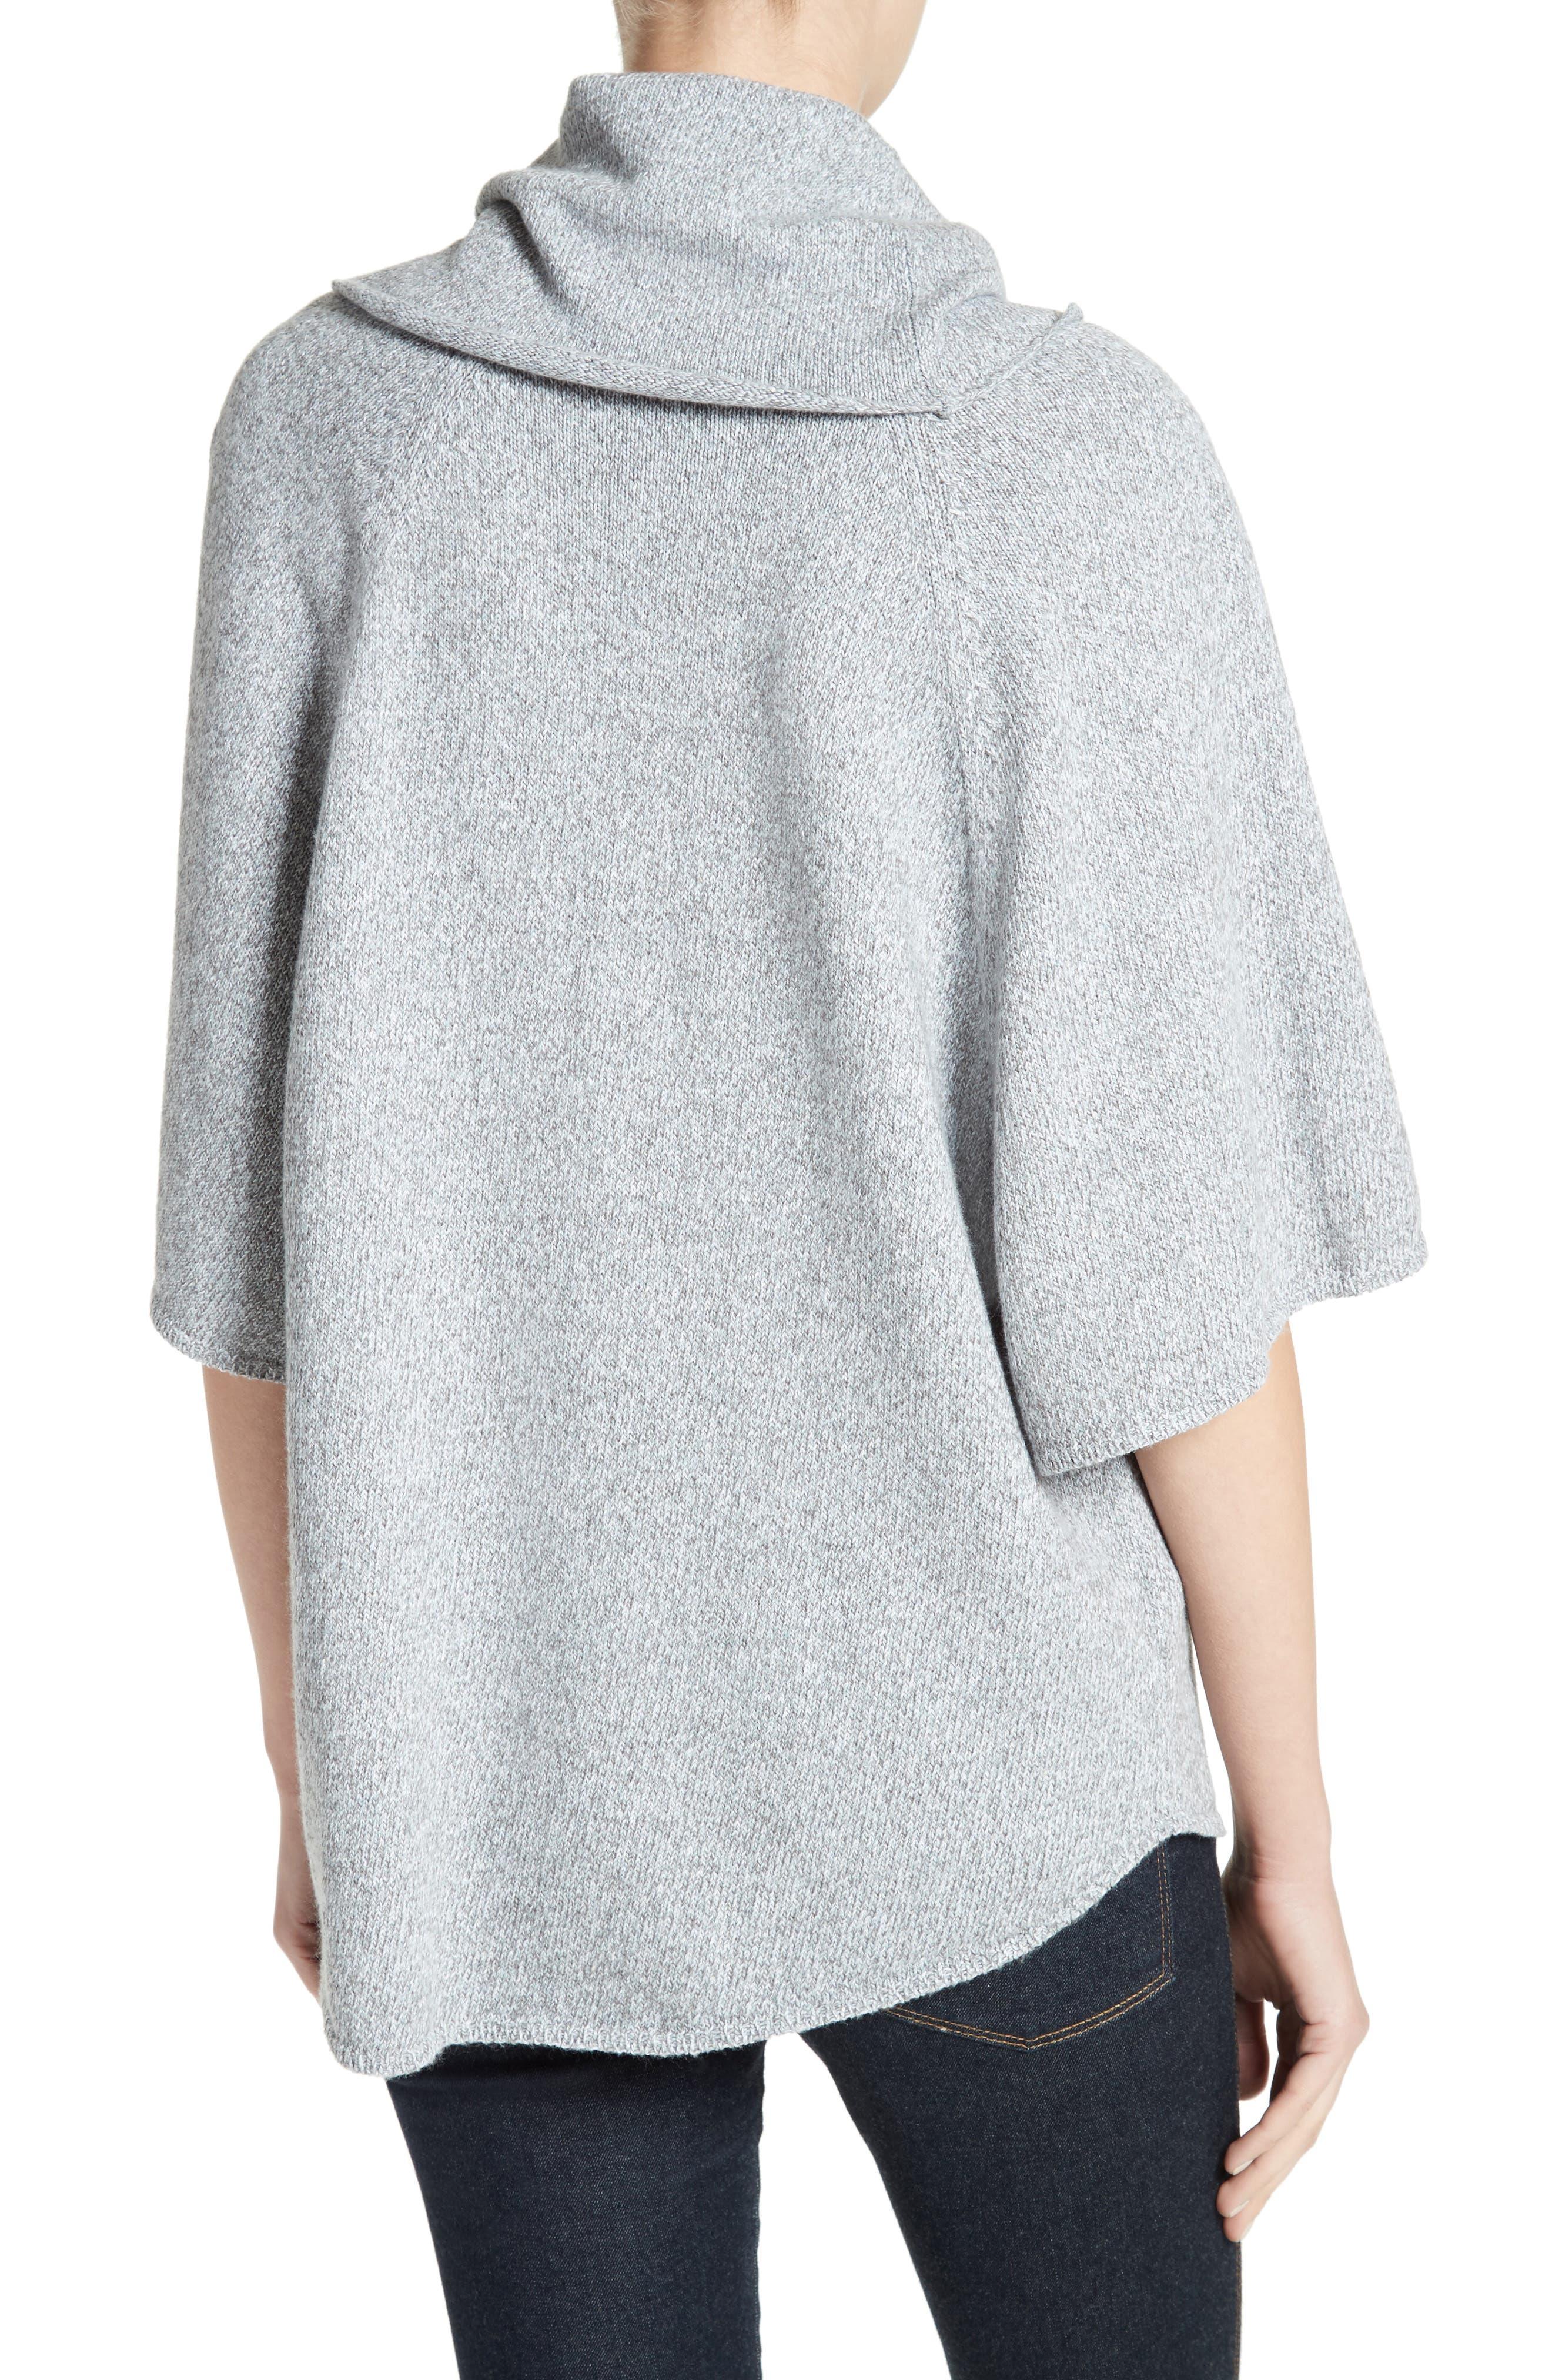 Celia Cowl Neck Sweater,                             Alternate thumbnail 2, color,                             Light Smoke Multi